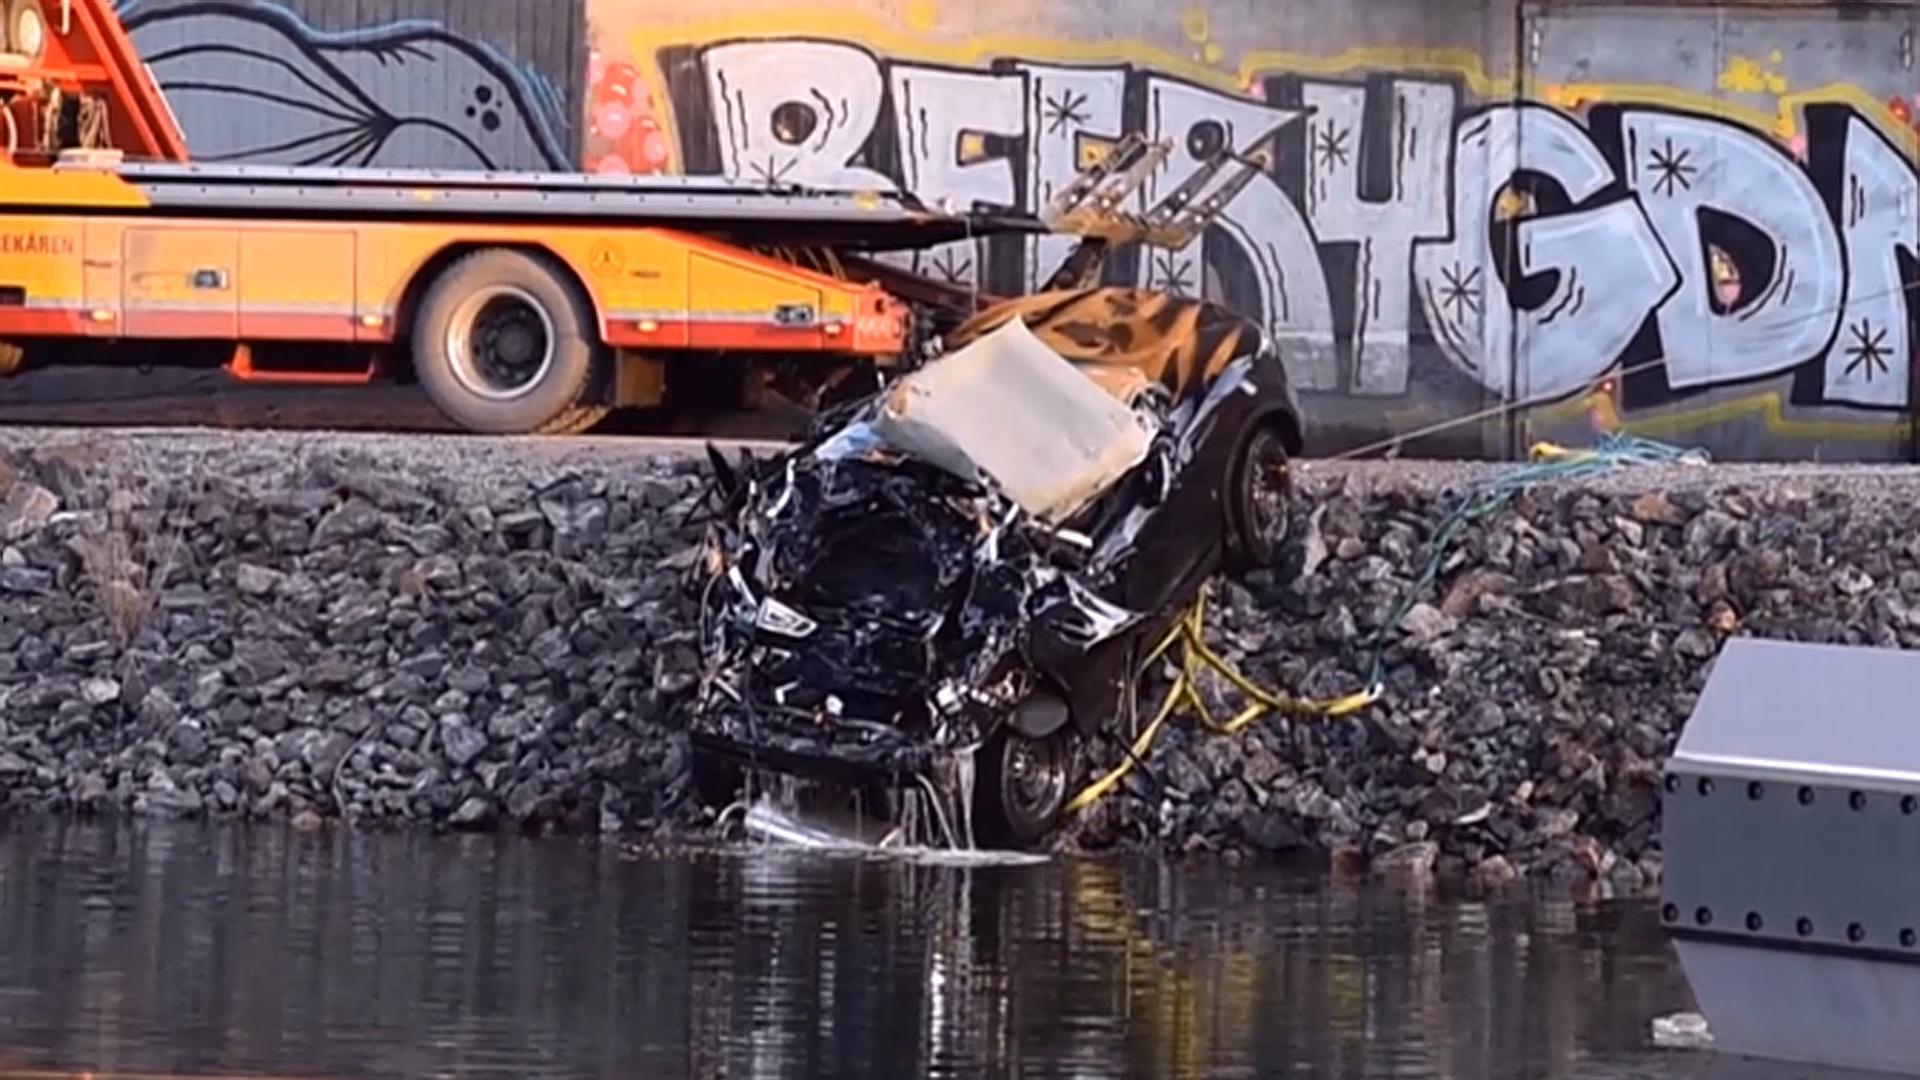 British Rock Band Viola Beach Killed in Car Crash in Sweden